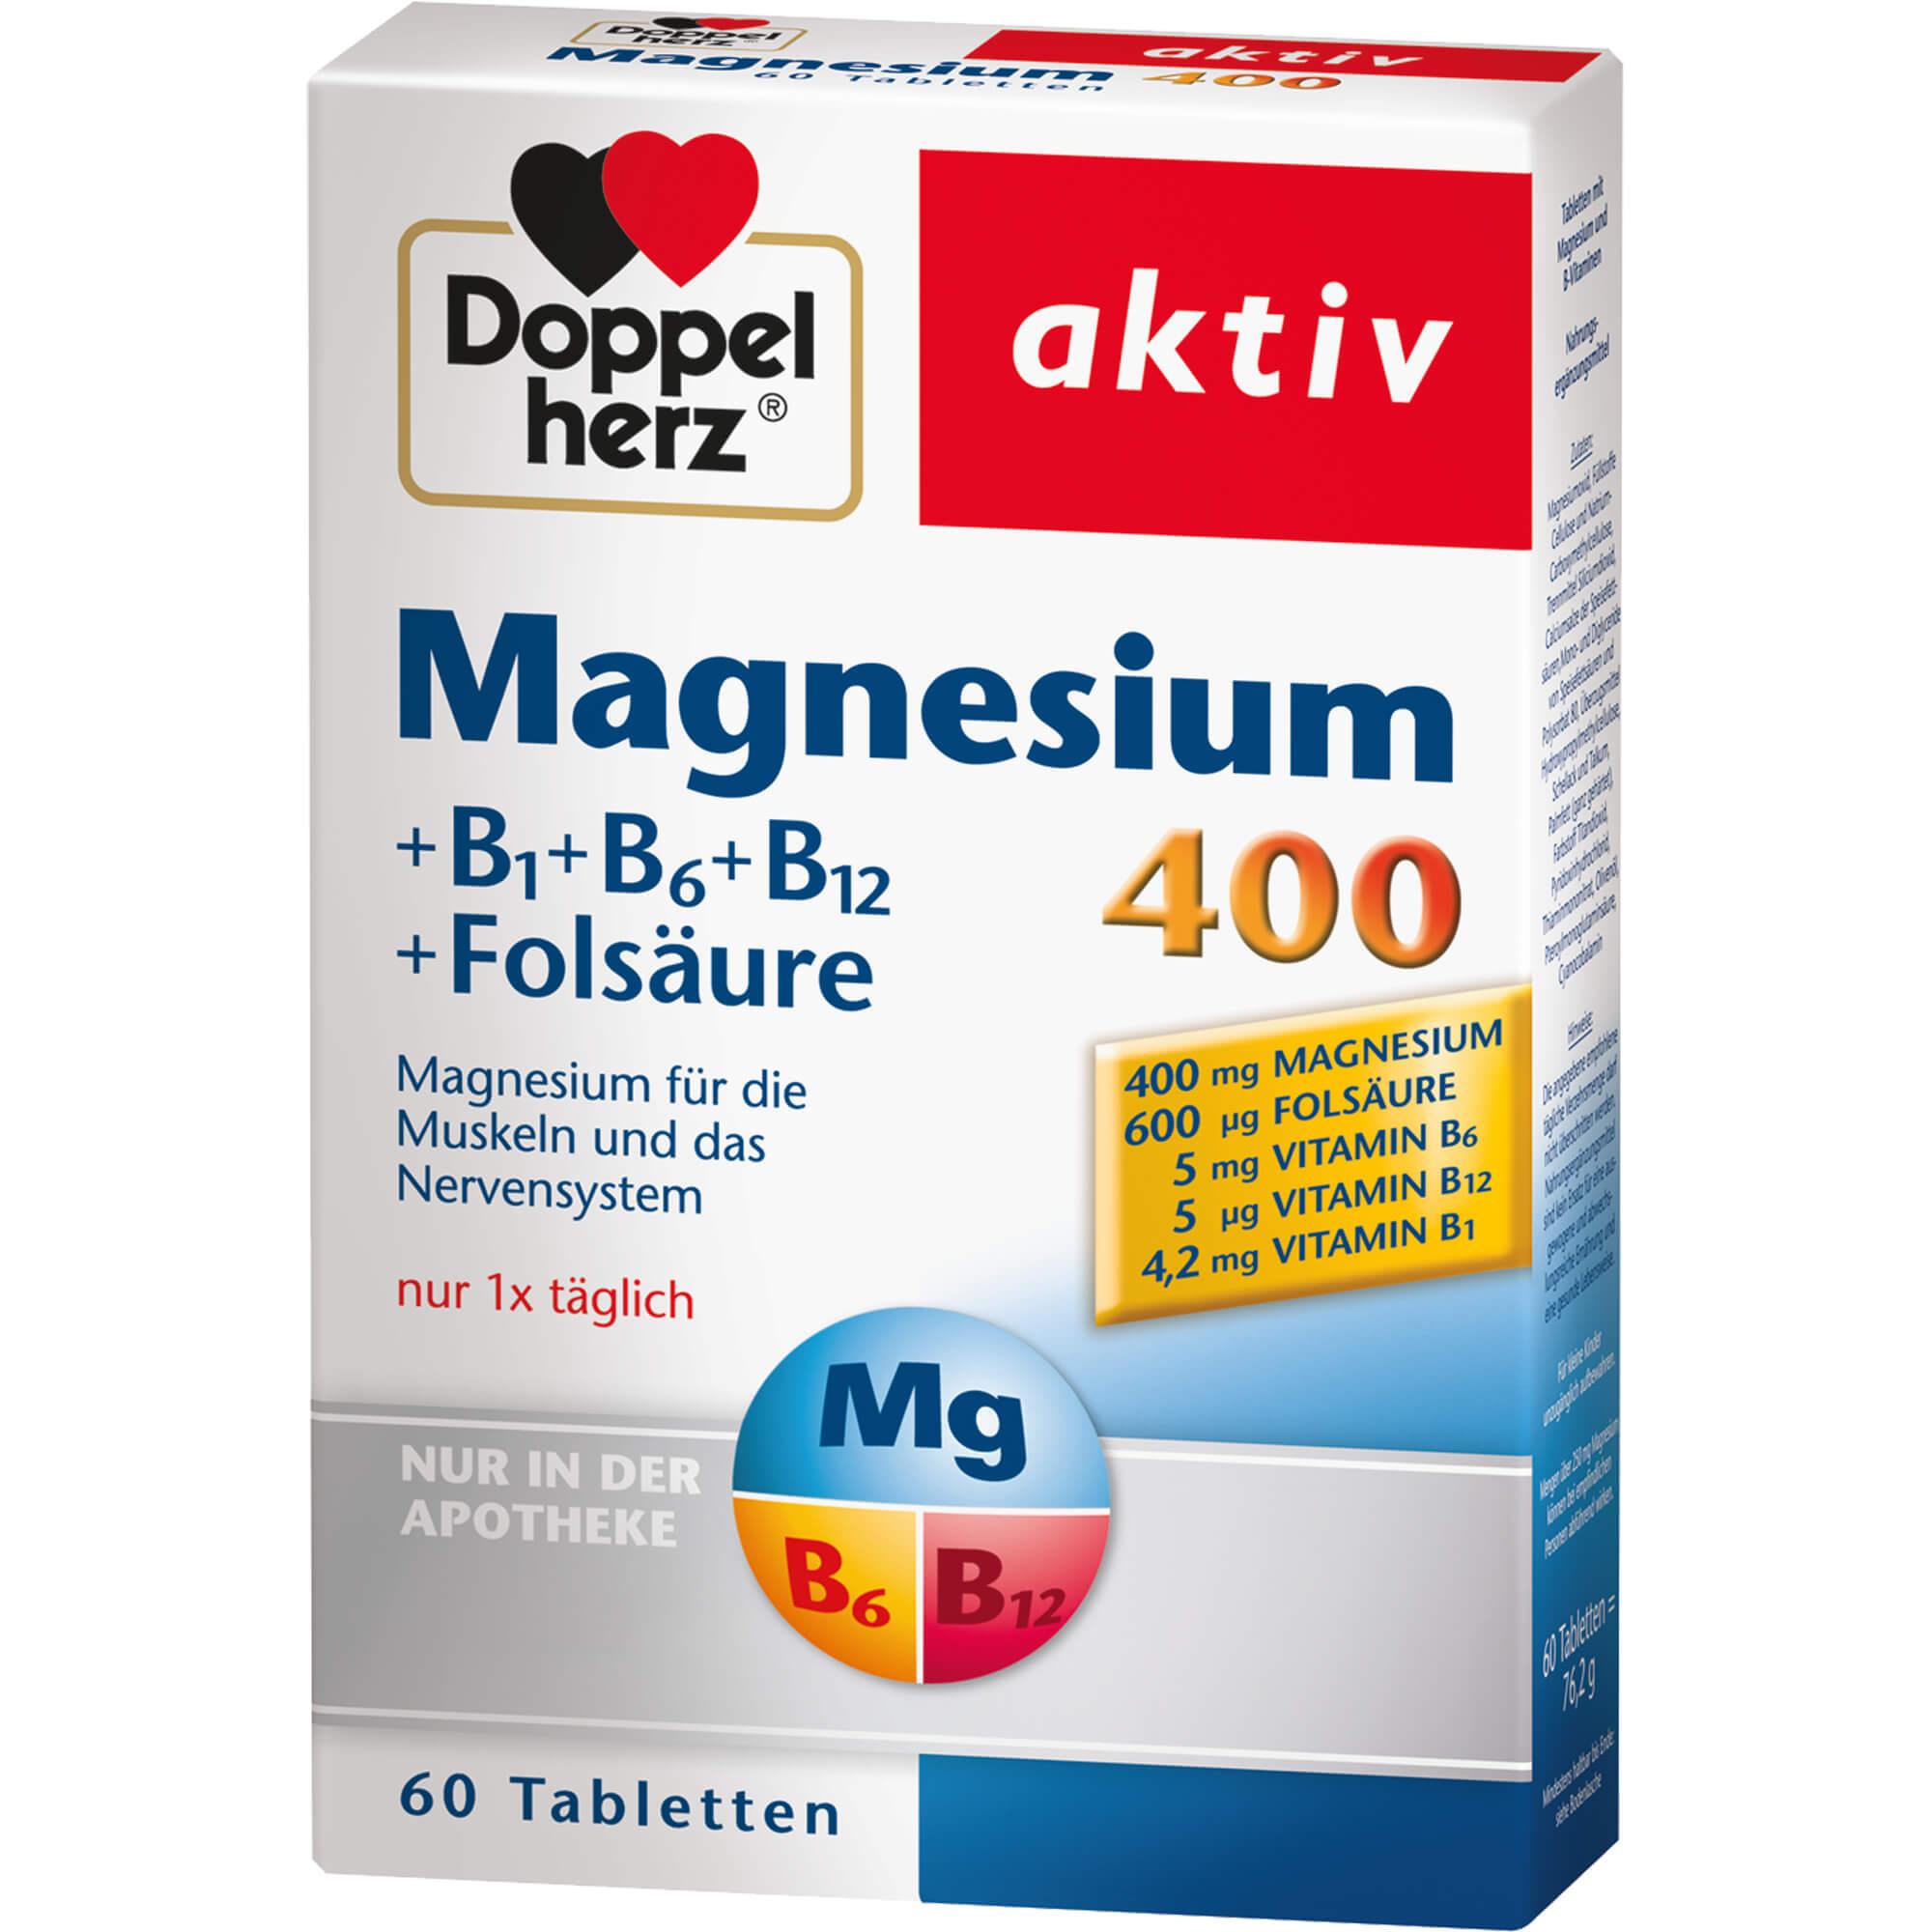 DOPPELHERZ Magnesium 400 mg Tabletten